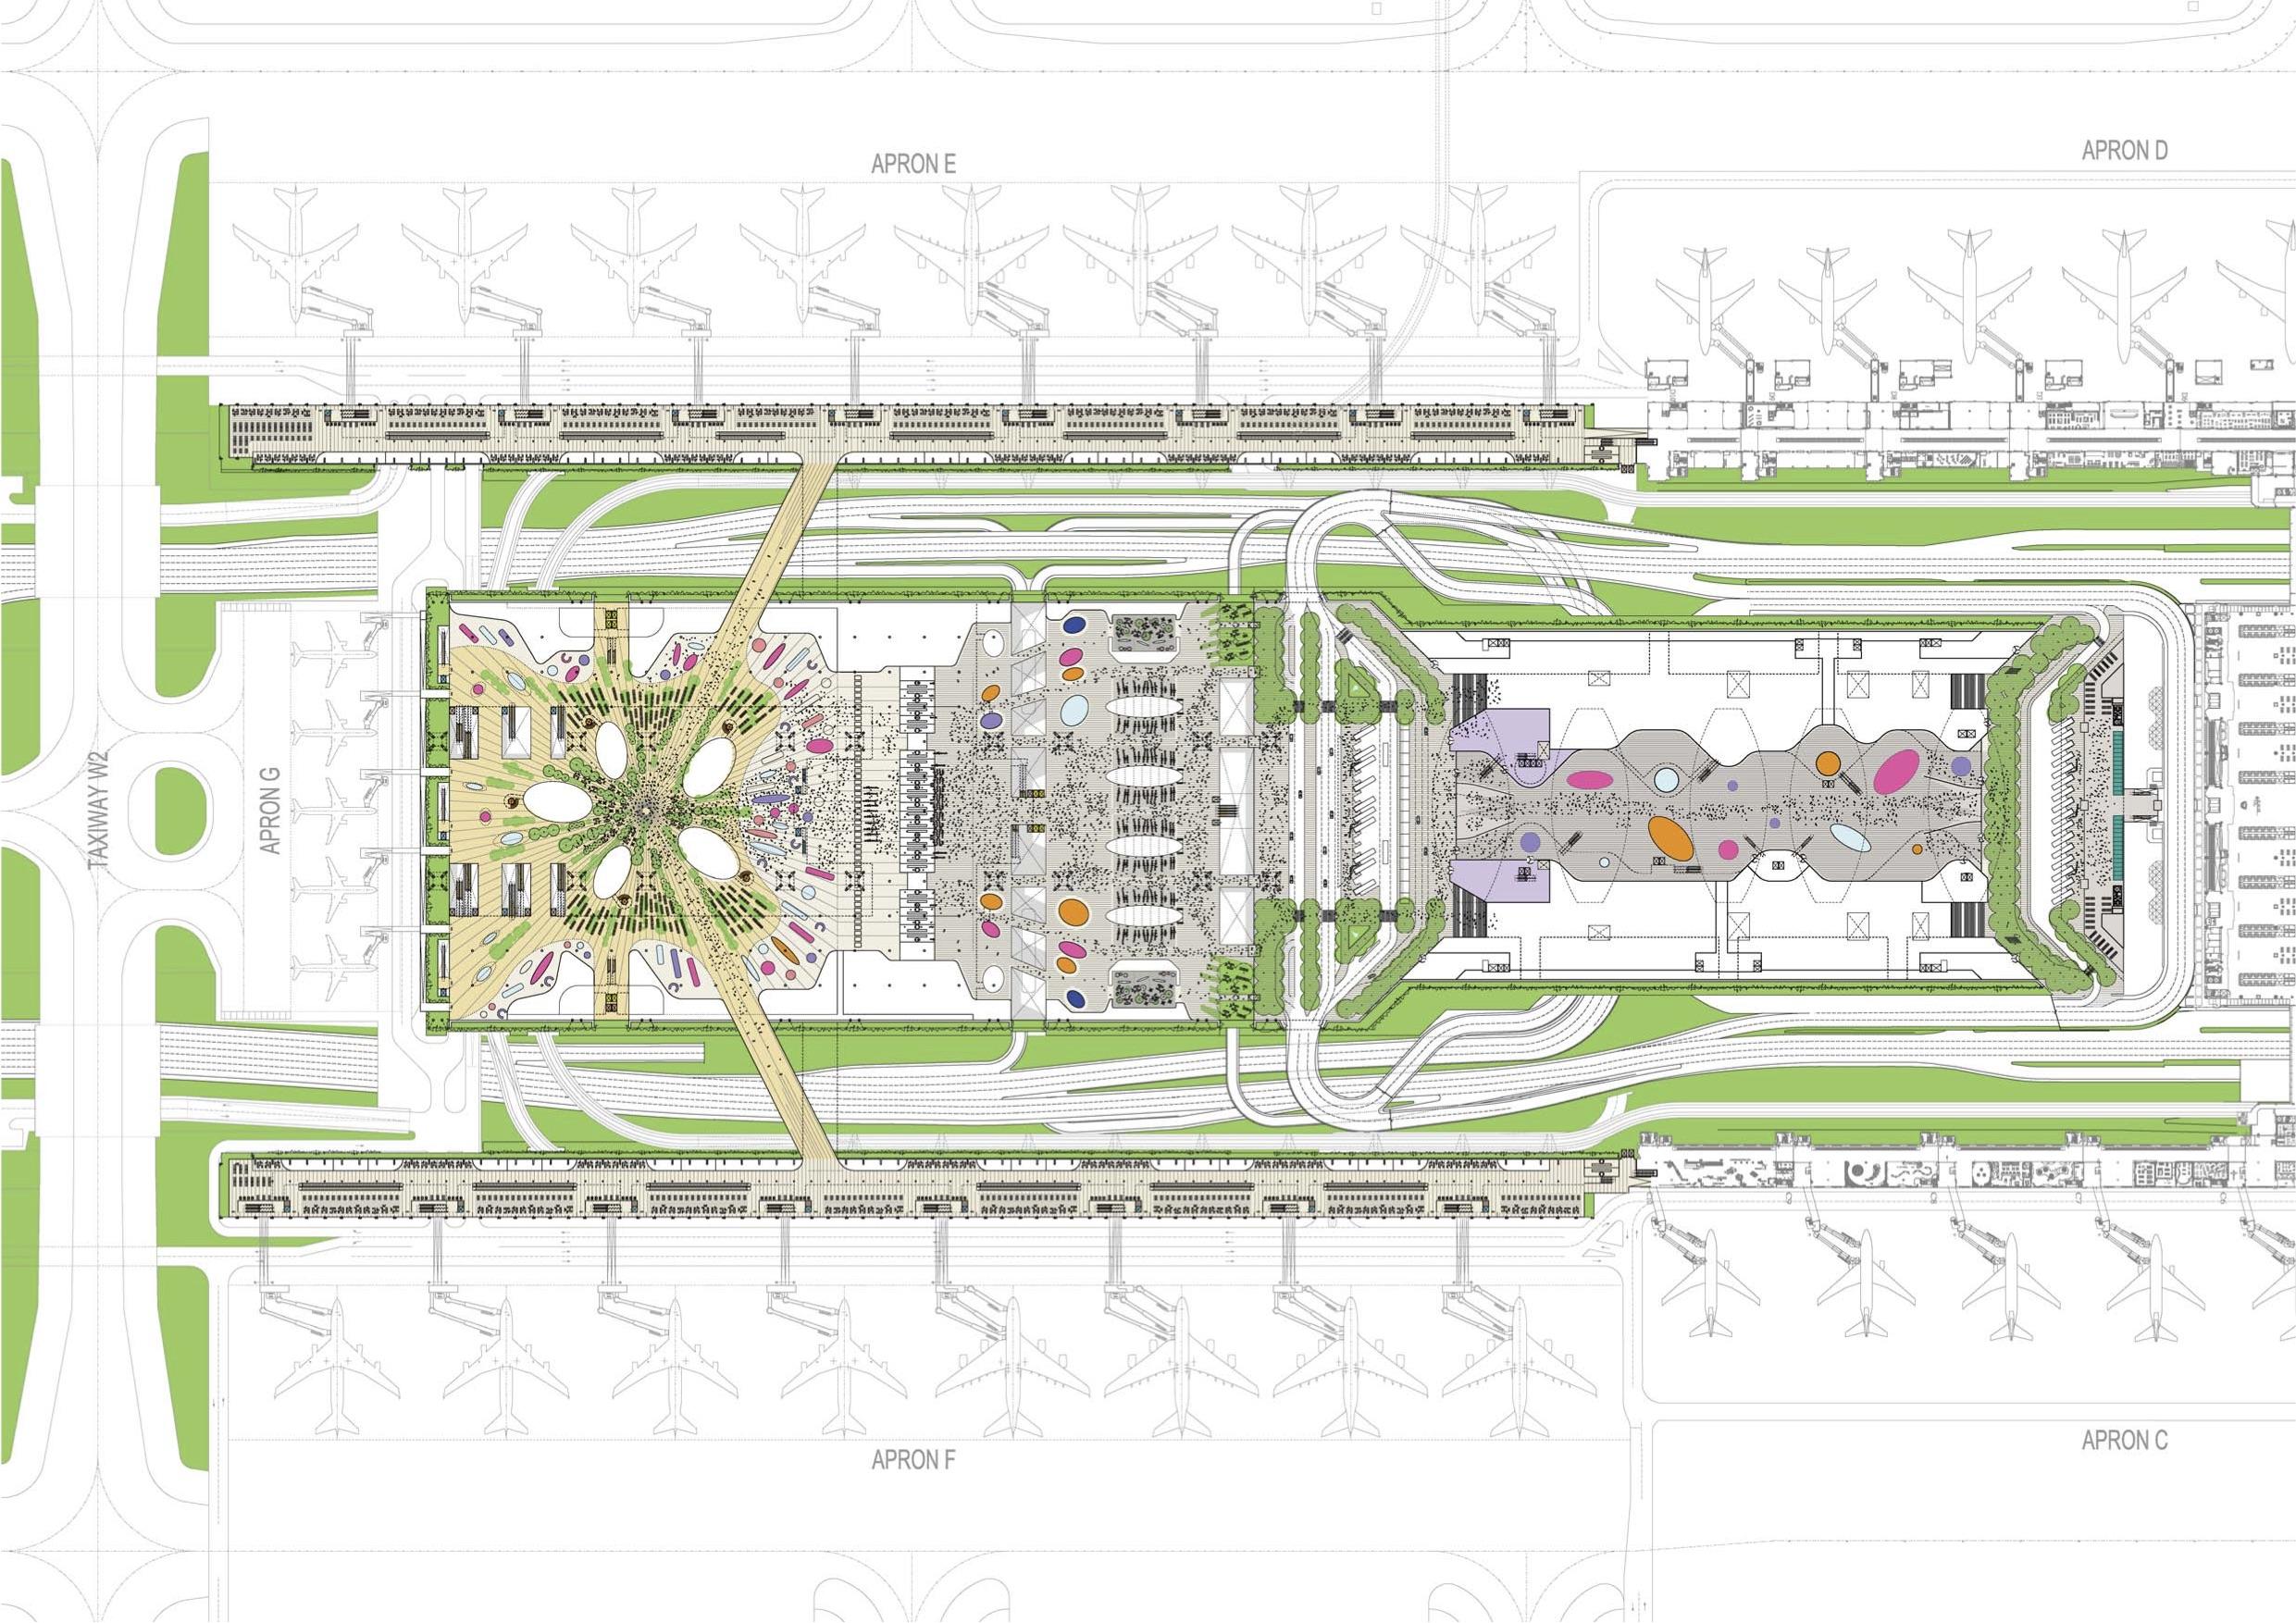 Taipei Taoyuan International Airport Terminal 3 Contract Awarded Thedesignair